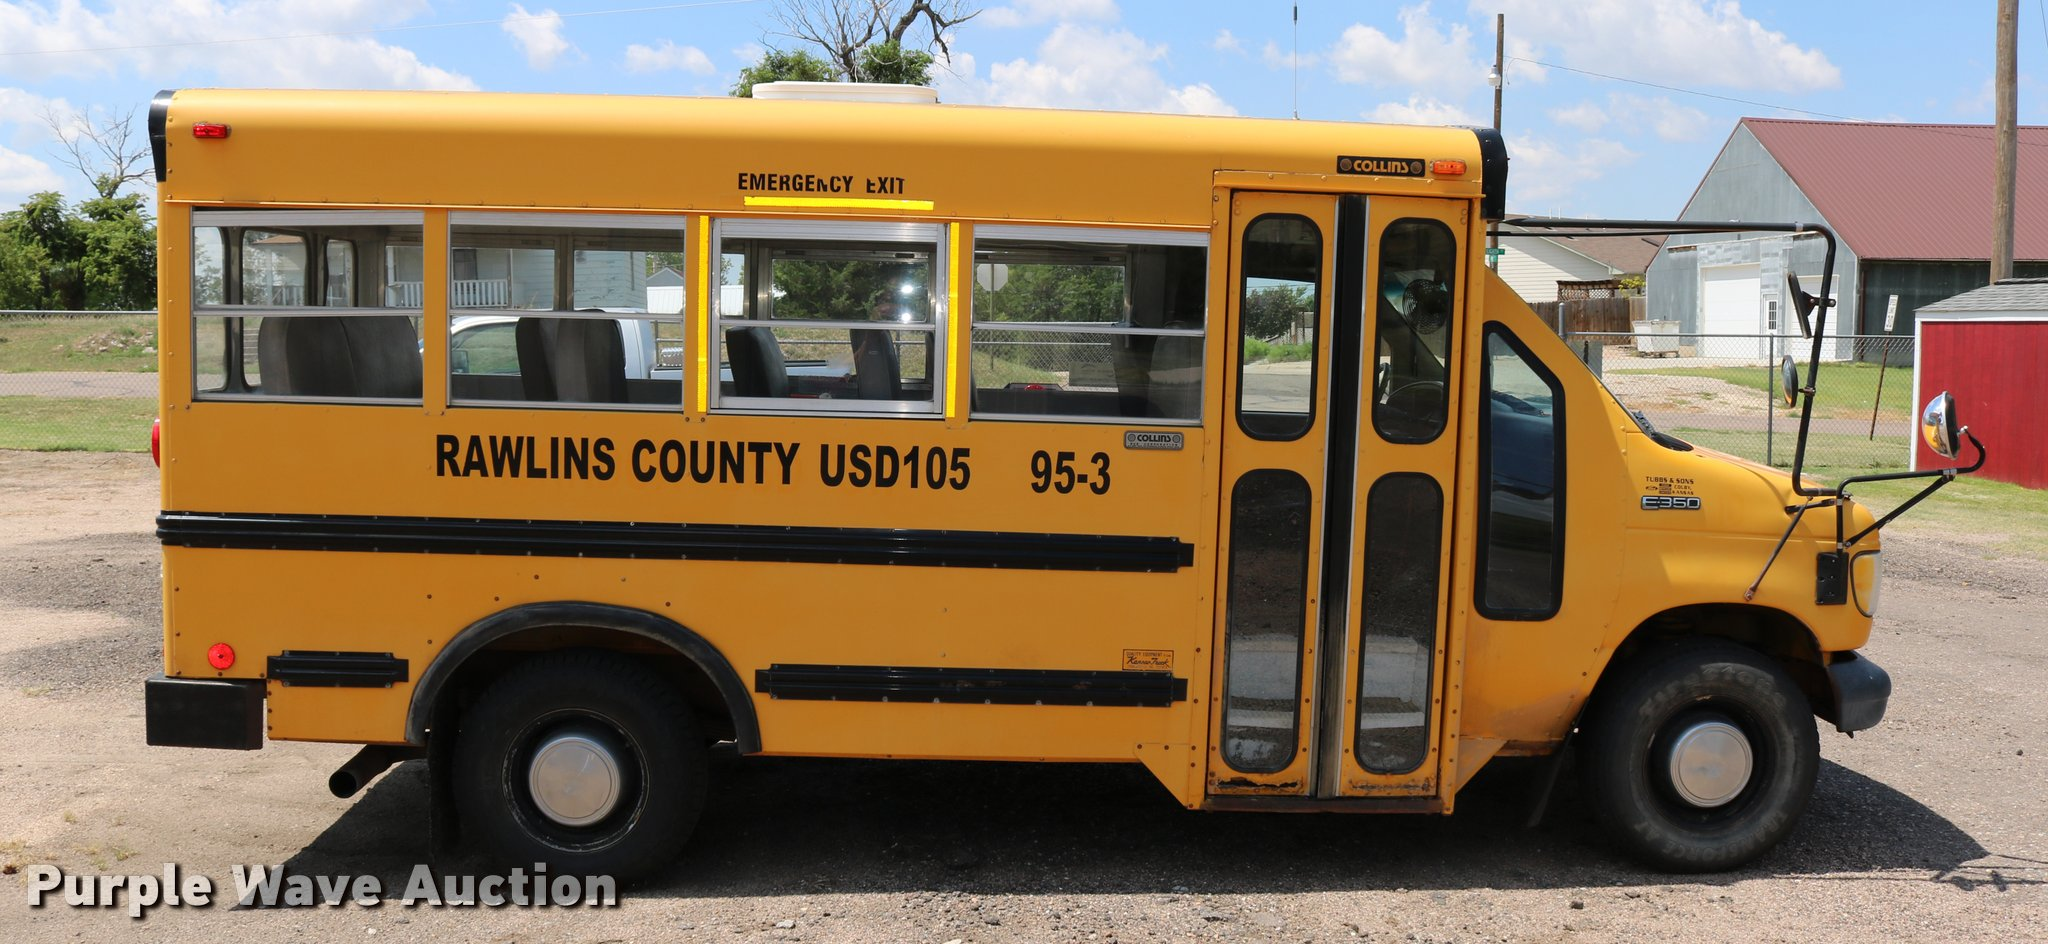 Collins E350 Rear Brake And Chevy 350 Hei Distributor Wiring Diagram School Bus 1995 Ford Econoline Item Db9271 Db9271c